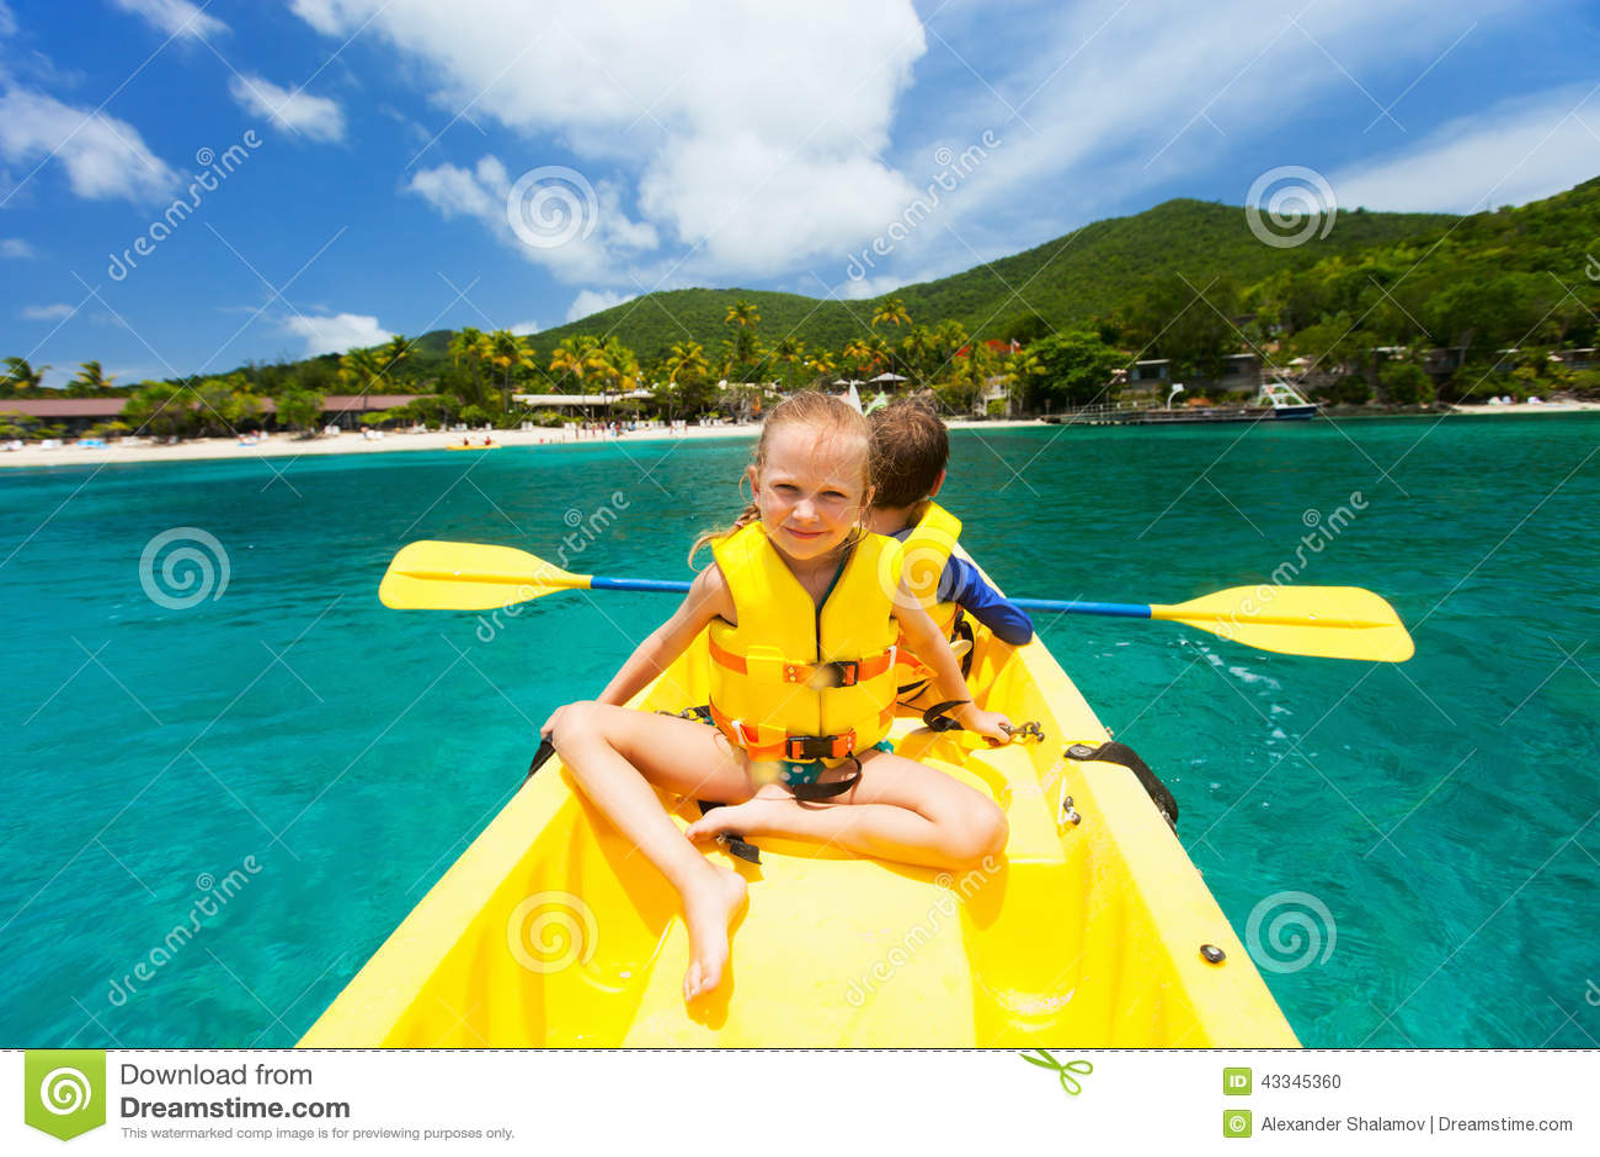 Kids in kayak stock photo. Image of holiday, people, canoe ...